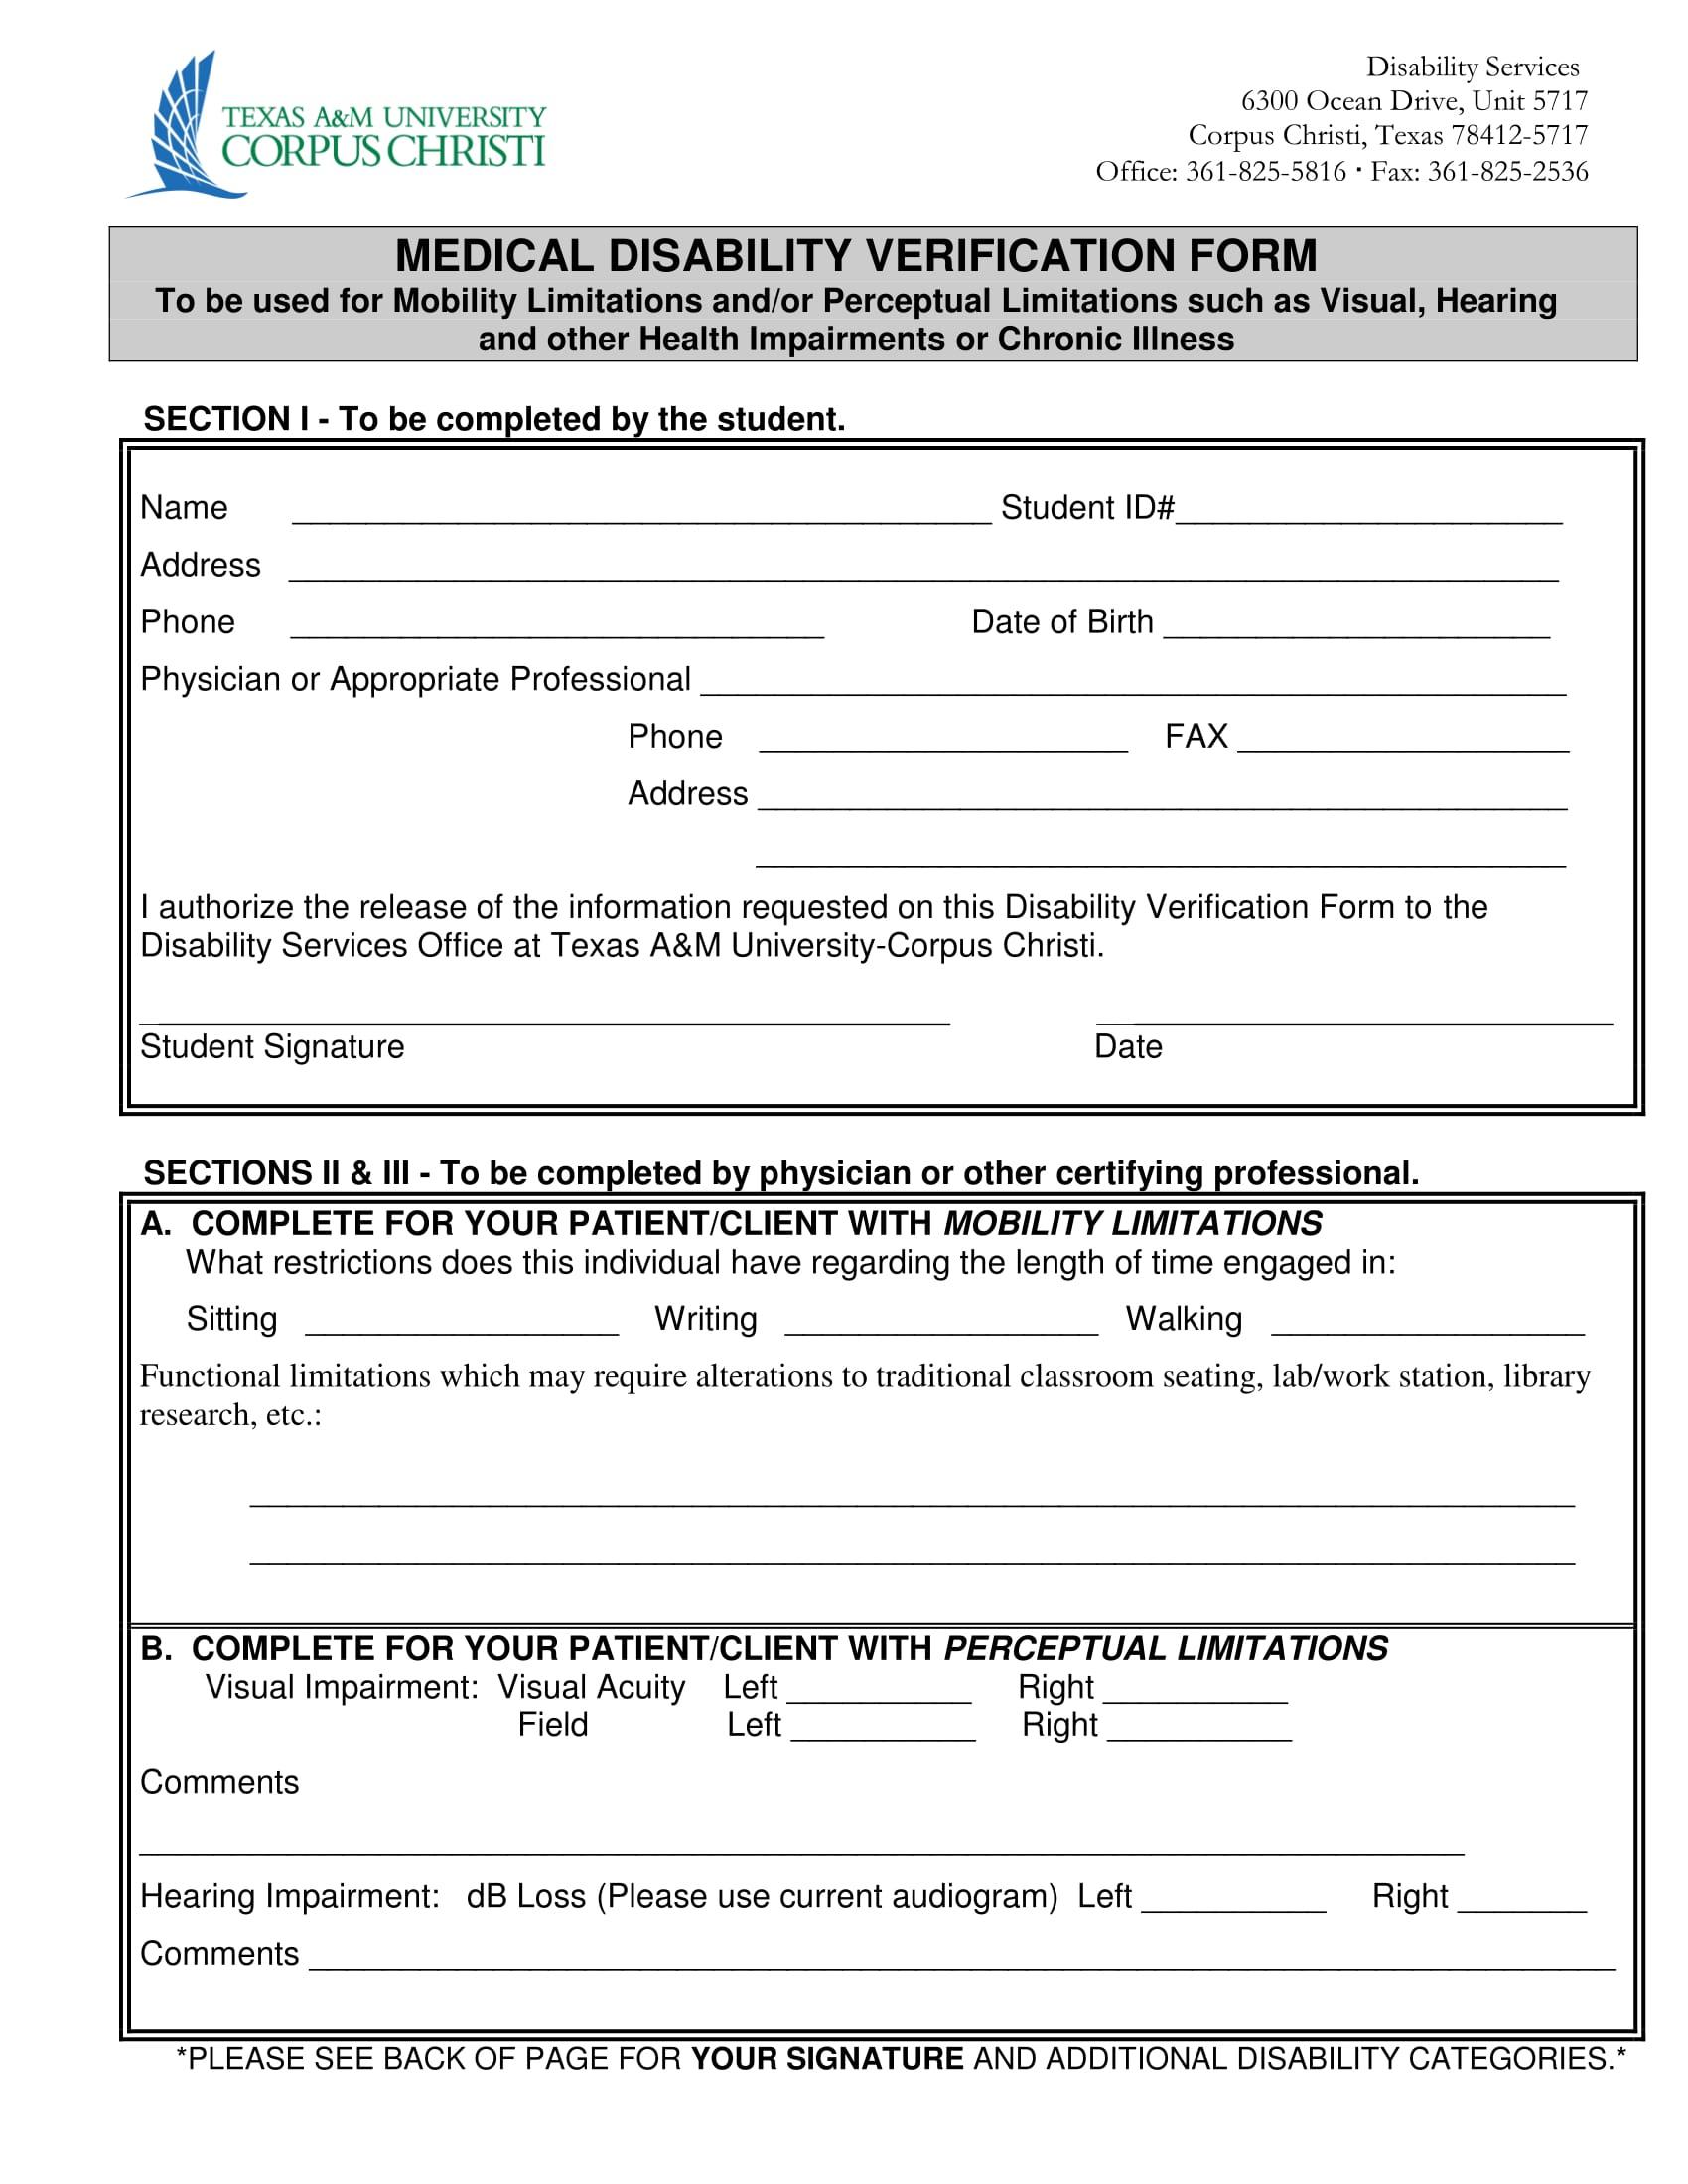 medical disability verification form 1